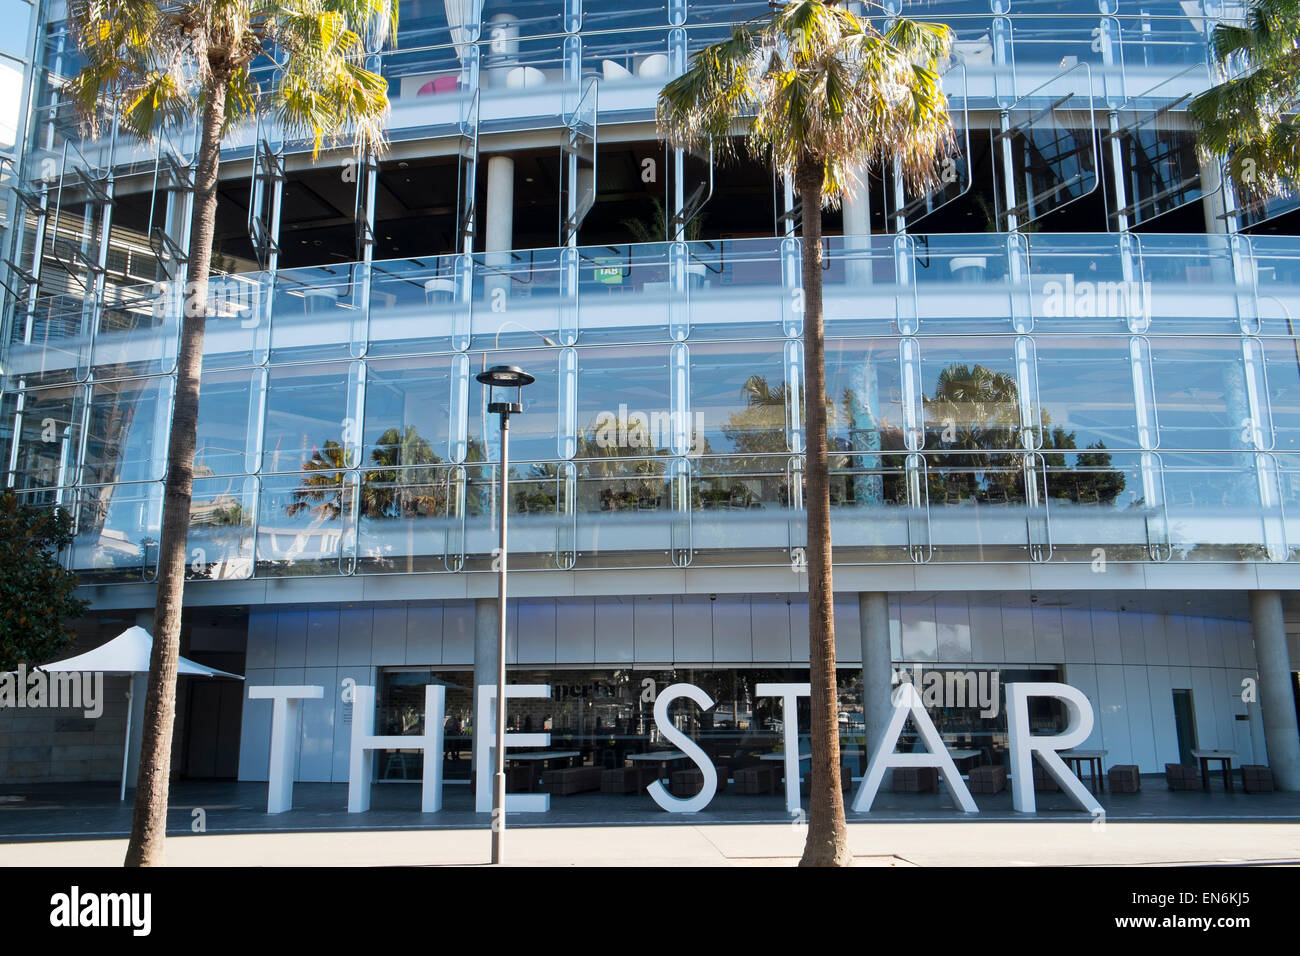 Er star casino rio hotel and casino nv